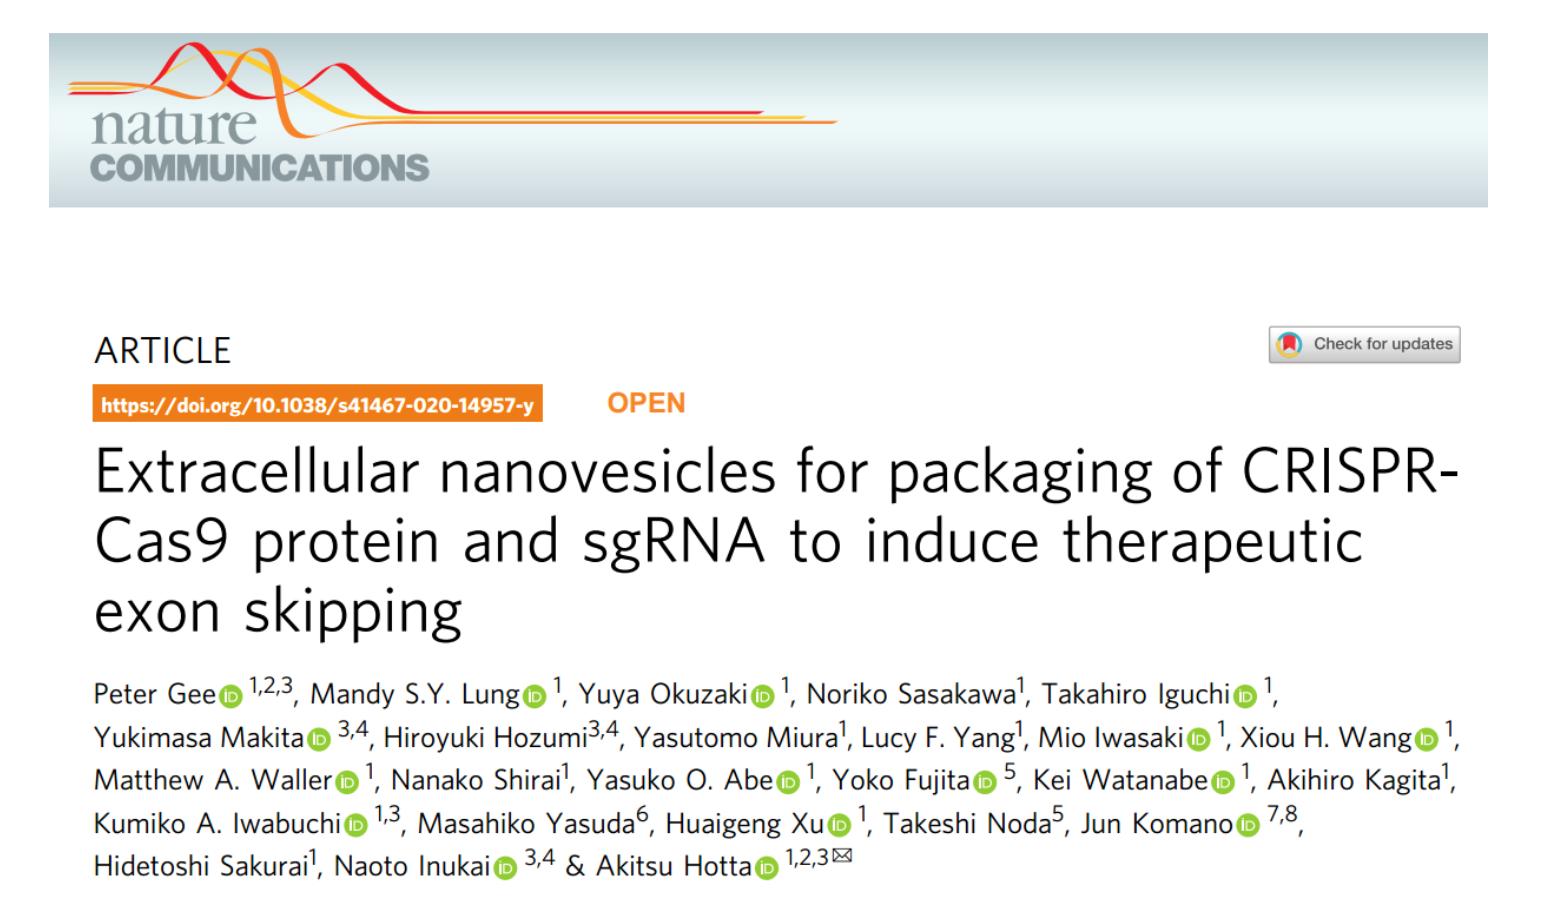 Nature子刊:EV用于包装CRISPR-Cas9蛋白和sgRNA以诱导治疗性外显子跳跃